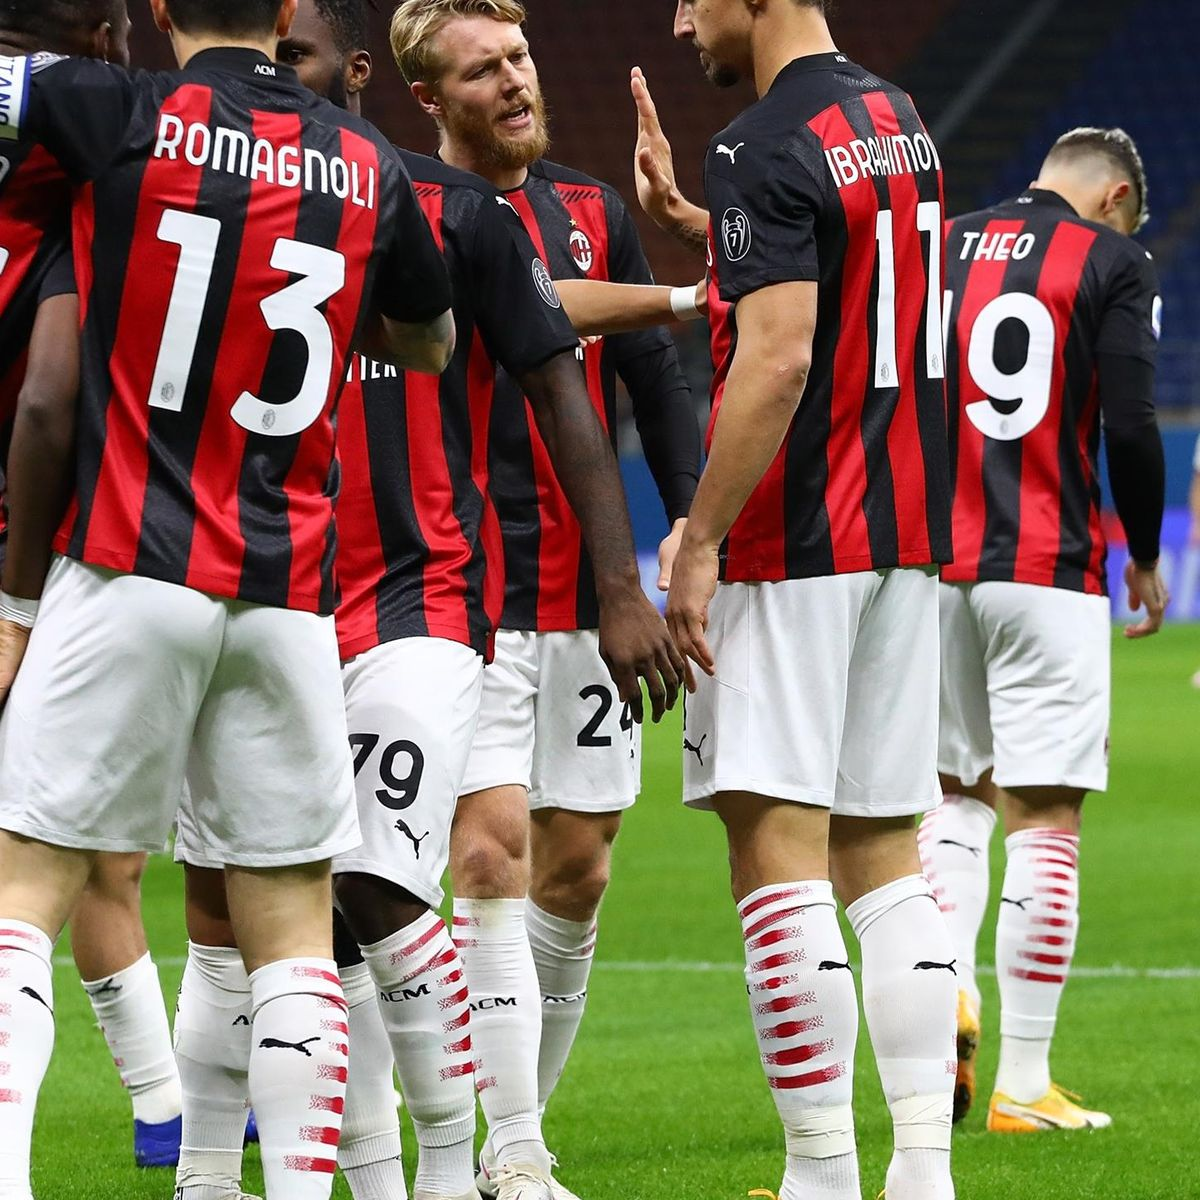 Serie A: doppio Ibra, Kumbulla nel finale: Milan-Roma 3-3 - Eurosport